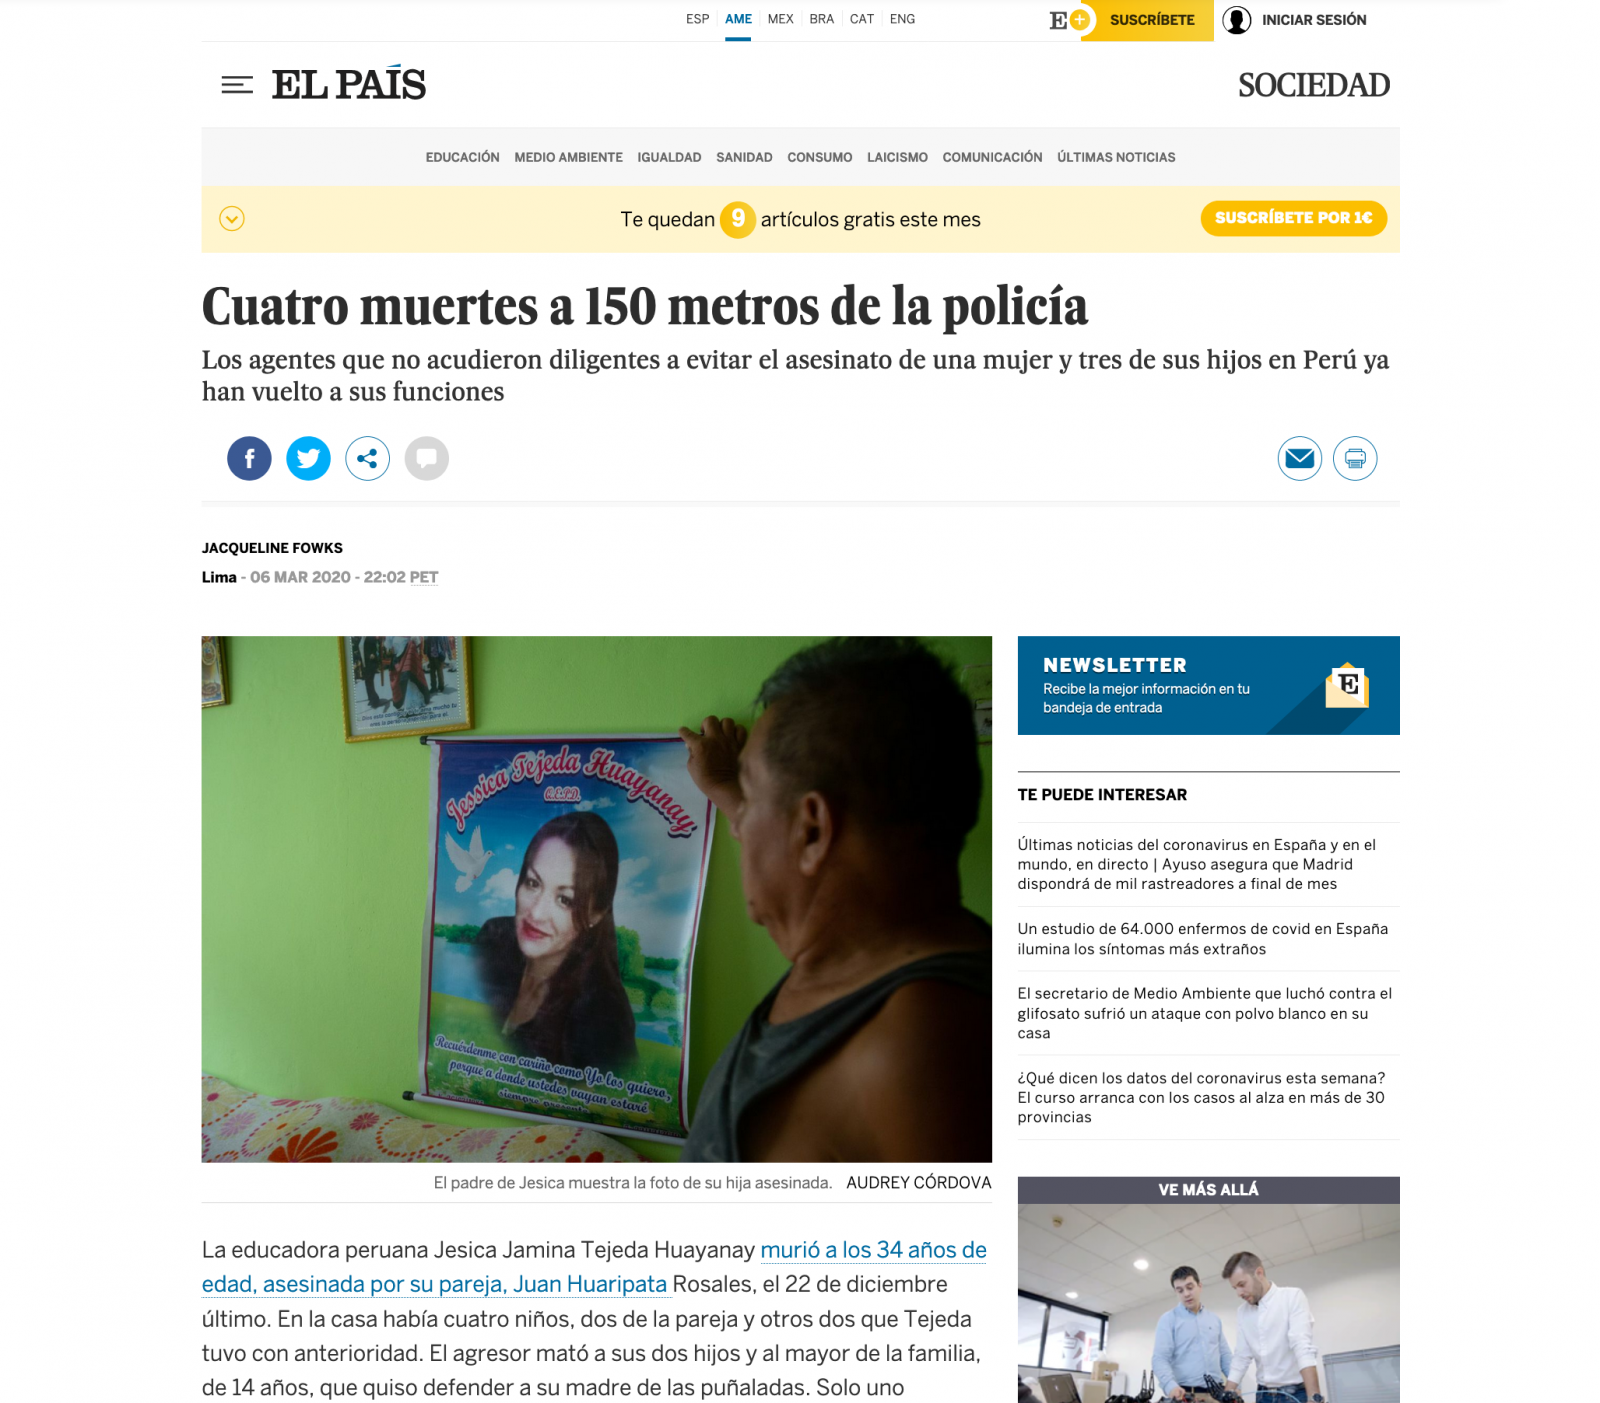 Photography image - Loading Captura_de_Pantalla_2020-09-05_a_la(s)_20.34.39.png